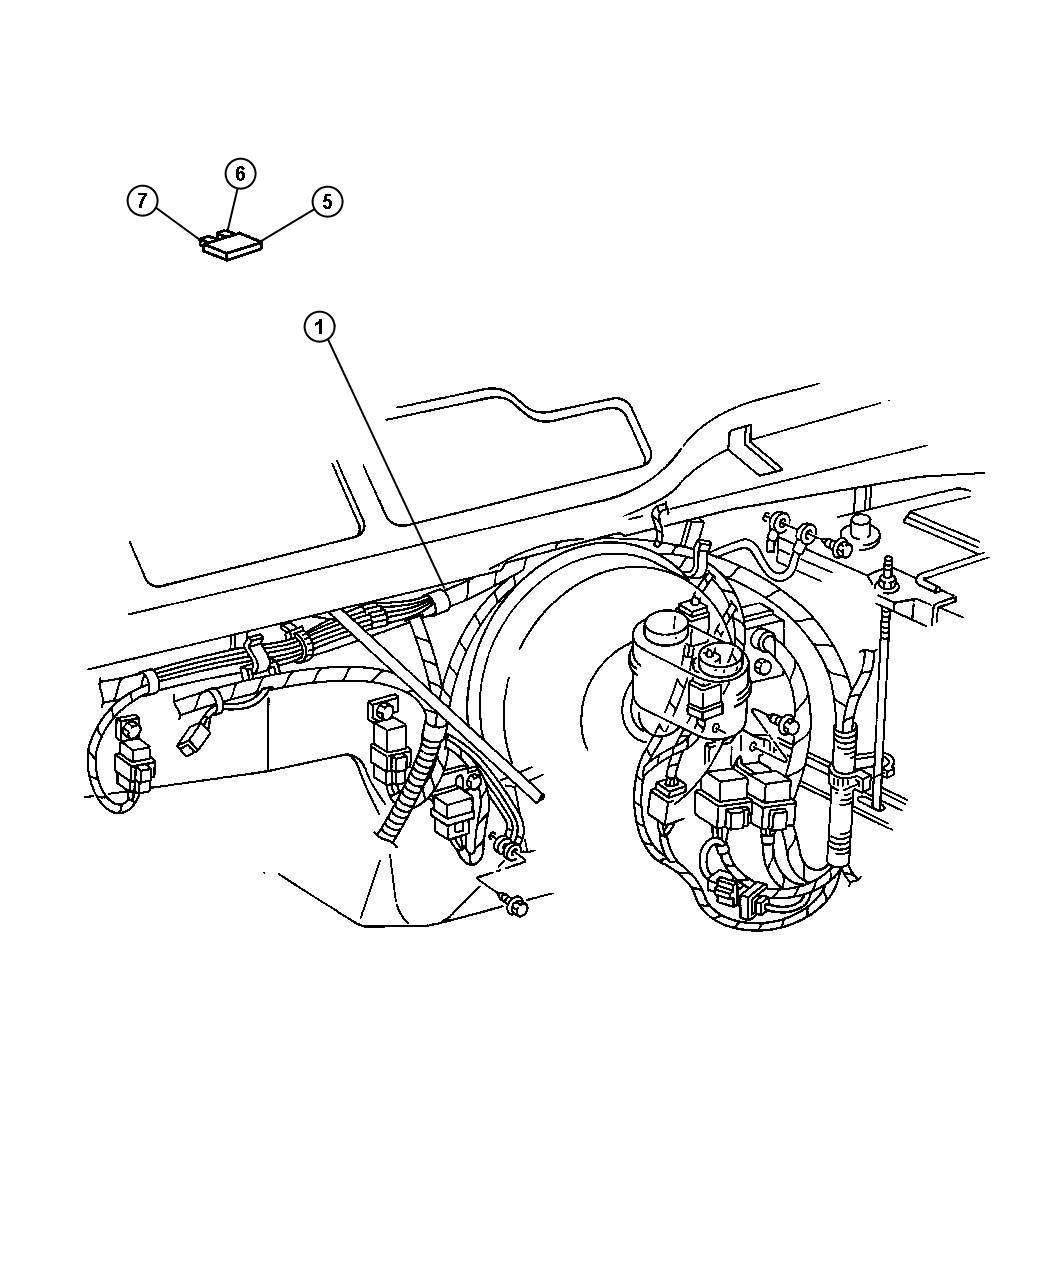 Chrysler Grand Voyager Relay. Electrical, radiator fan